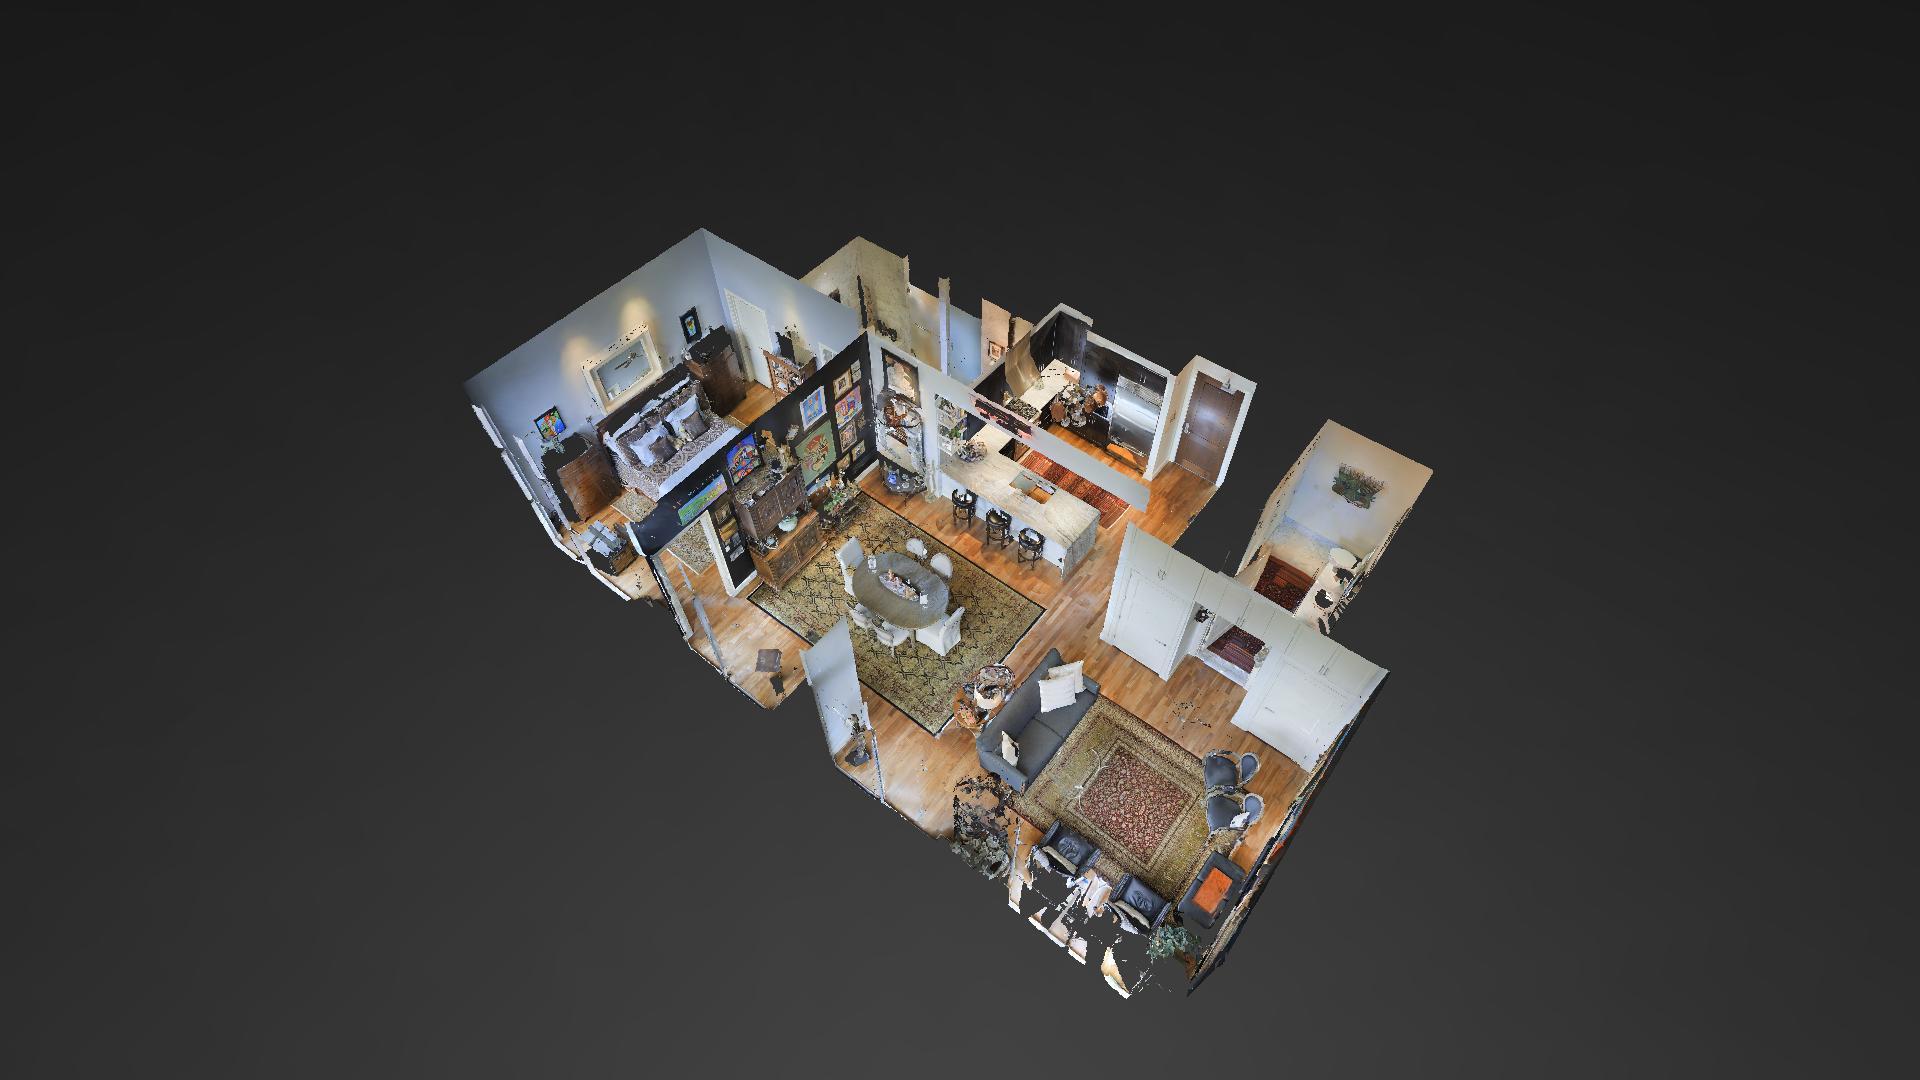 3D Model and Virtual Walkthrough